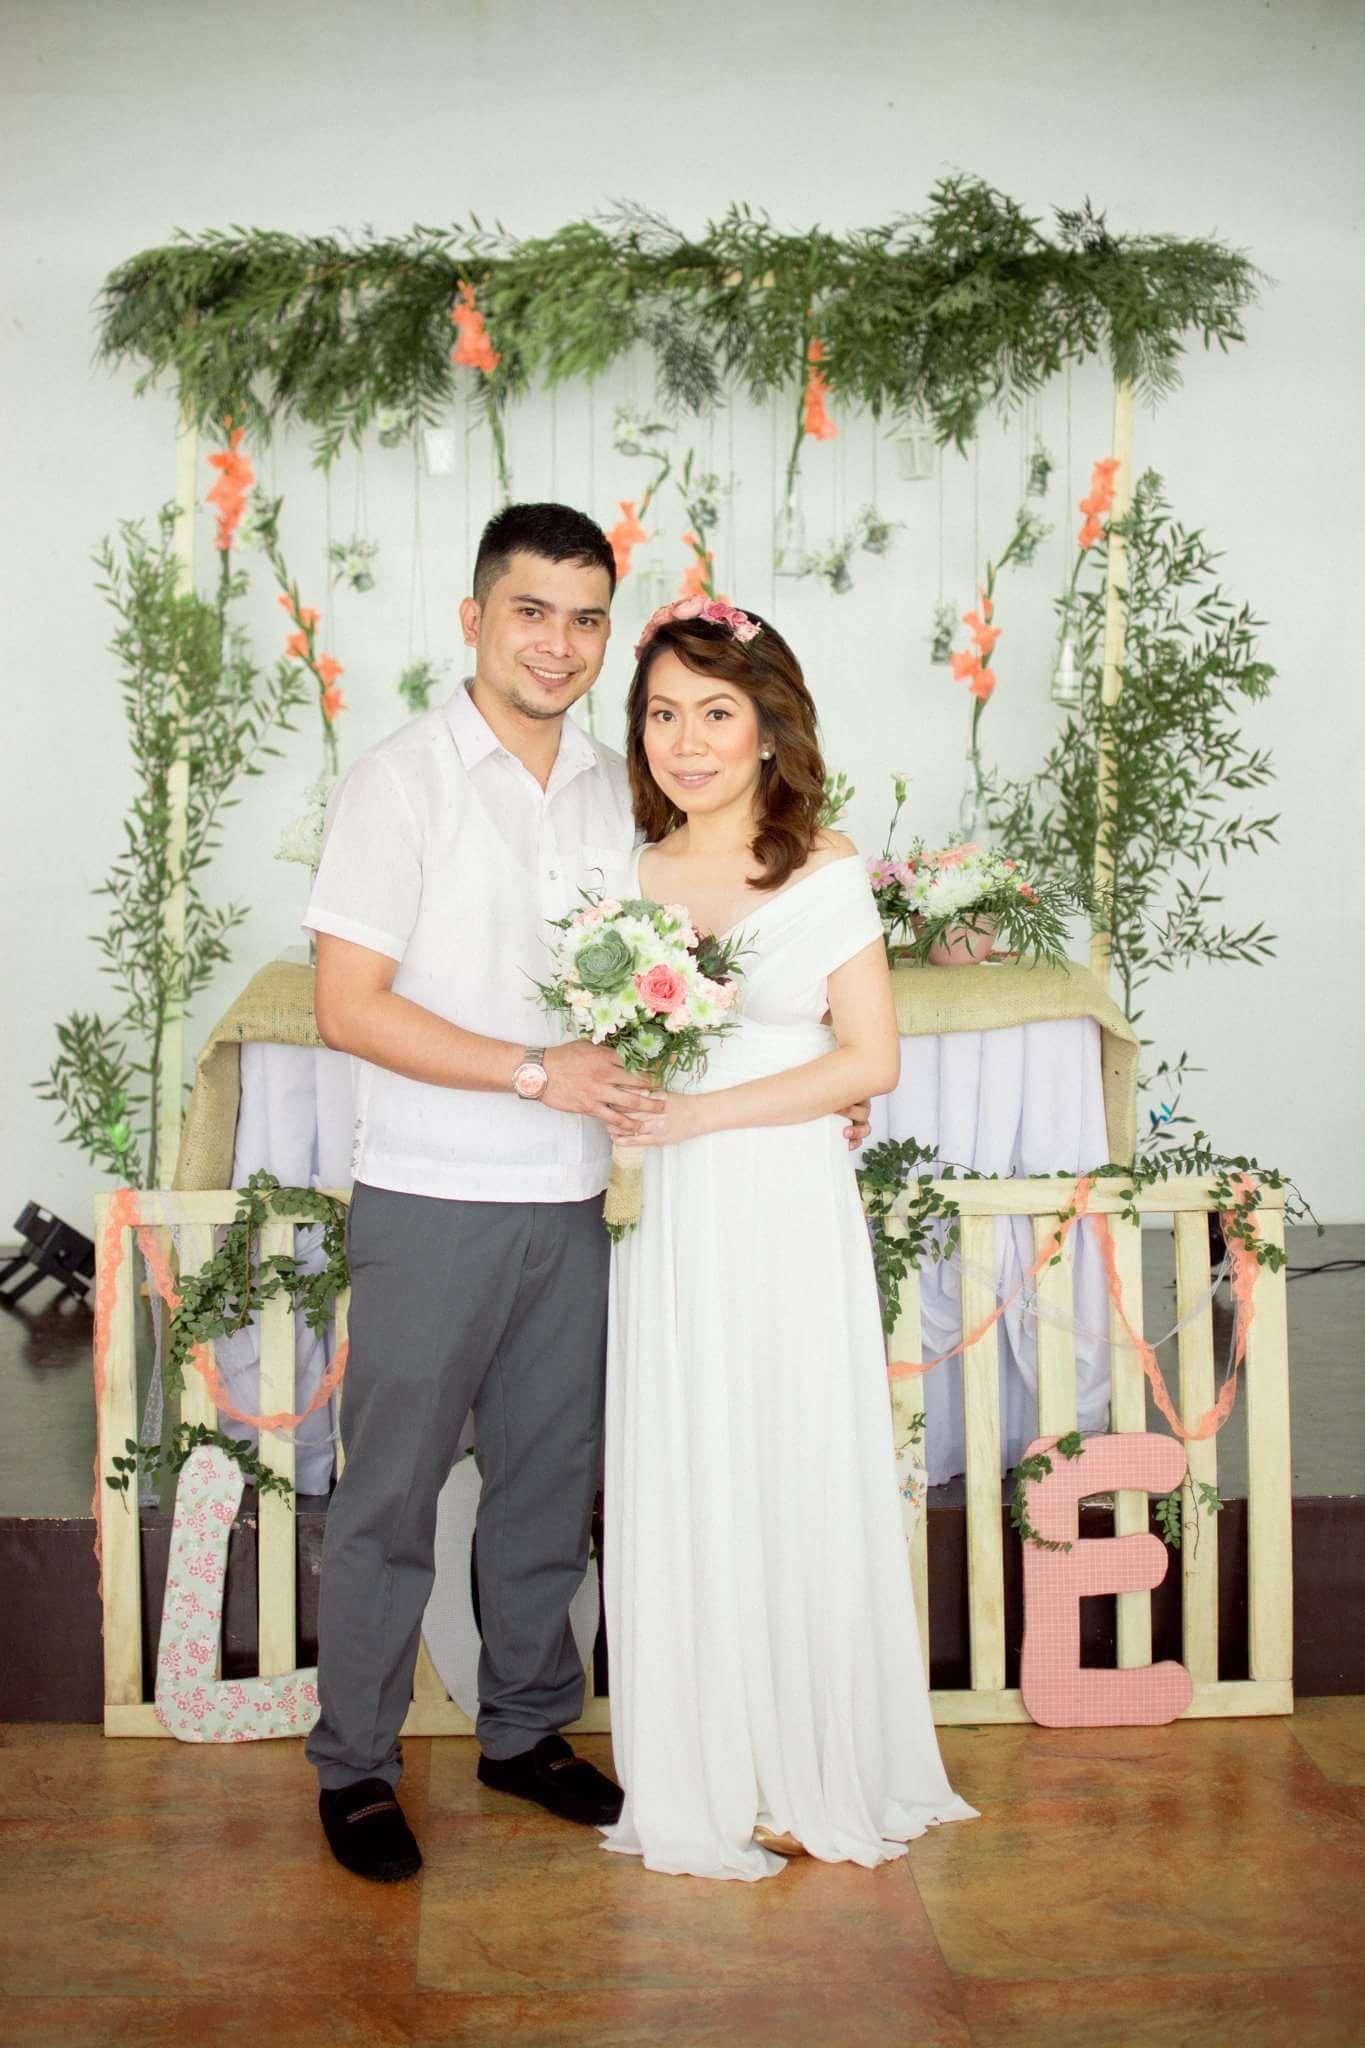 rustic themed civil wedding | simple wedding | Pinterest | Simple ...